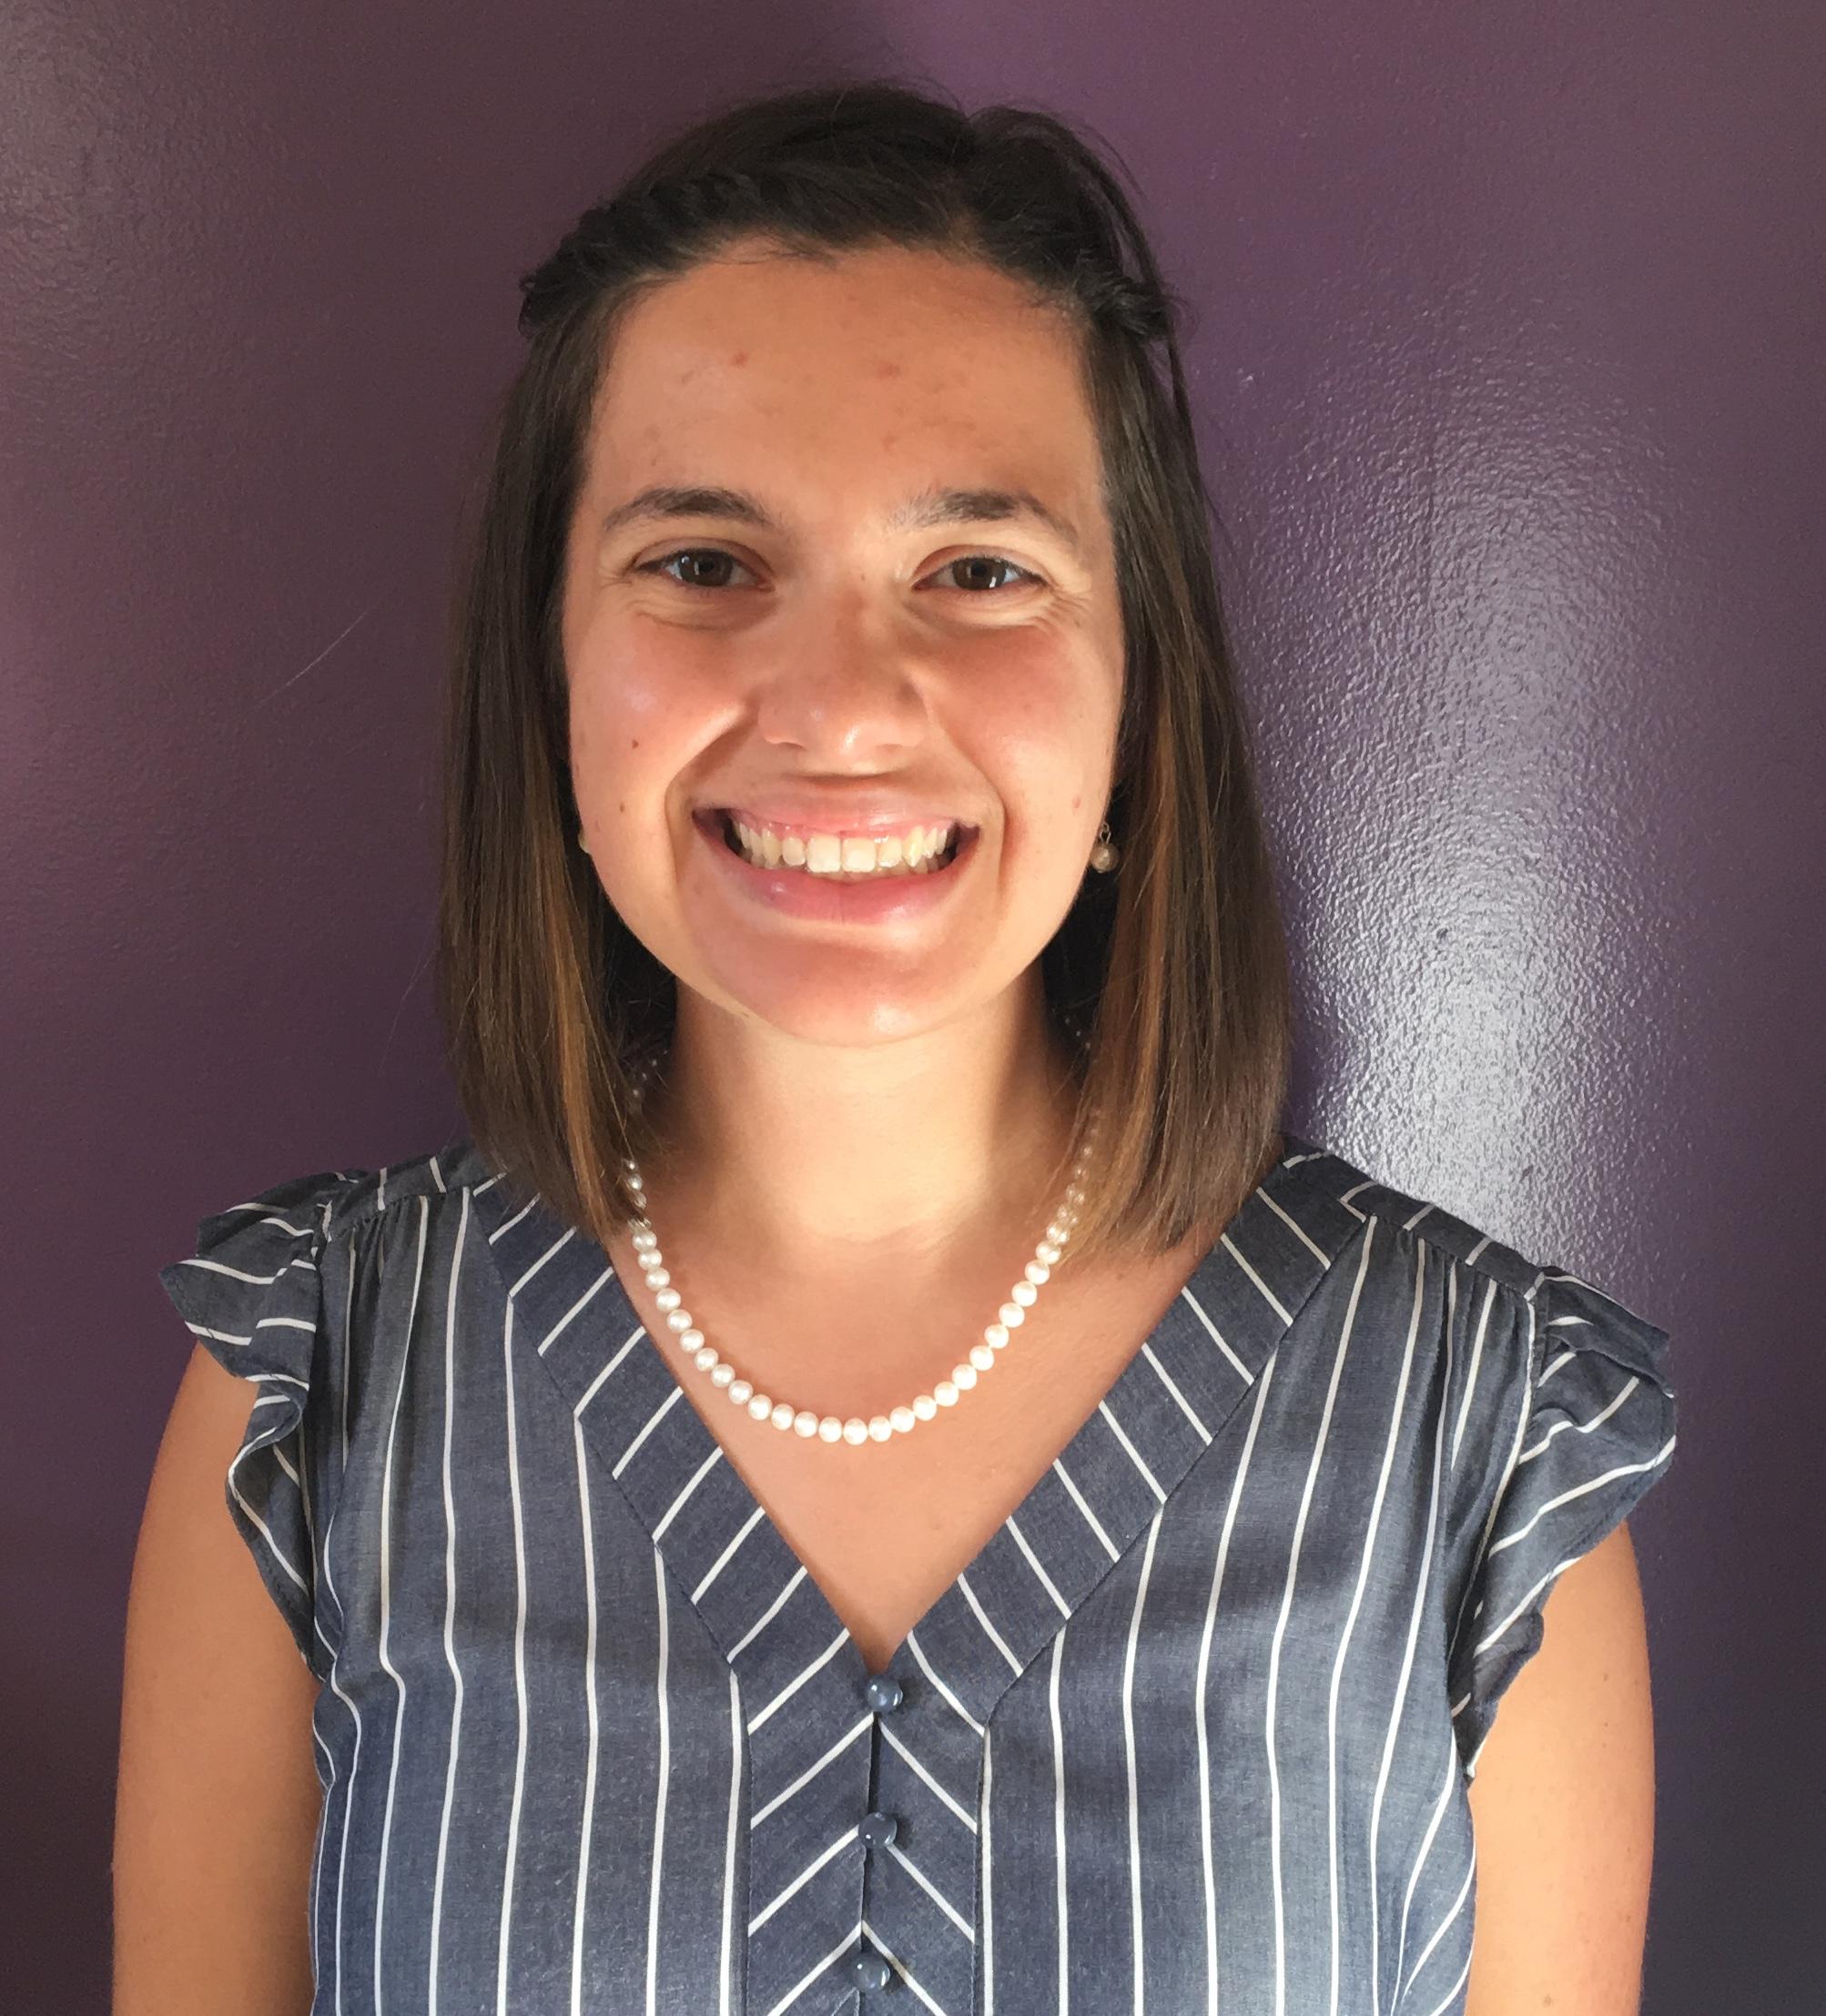 Meet Freedonia's Graphics Coordinator Josephine DiNovo